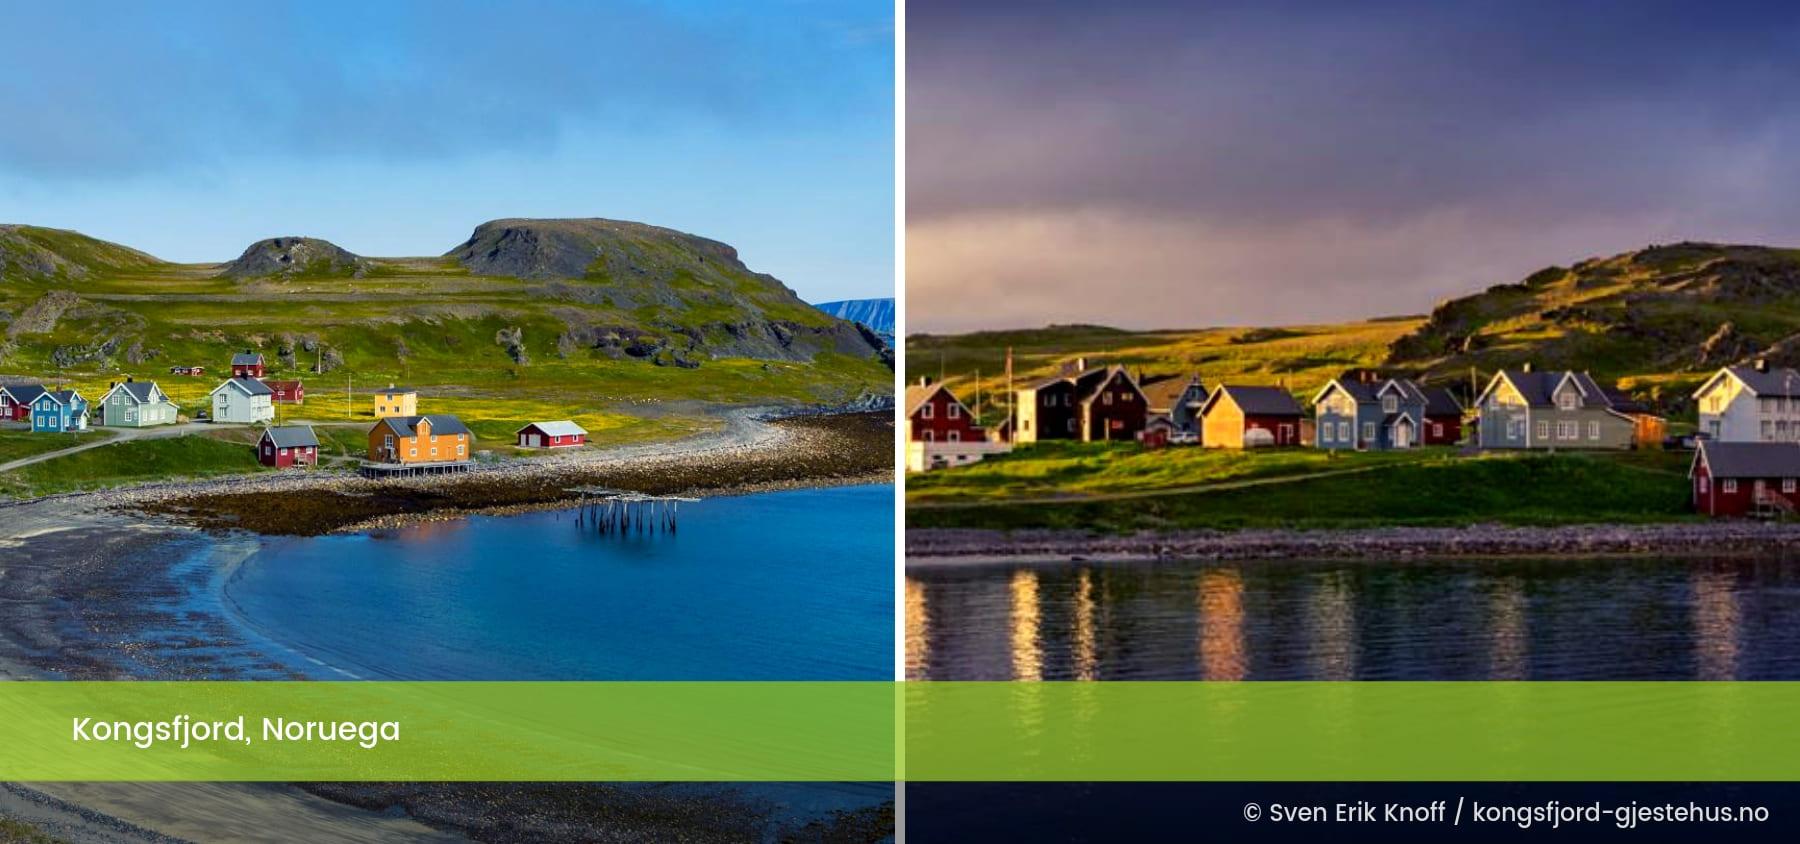 Kongsfjord Noruega